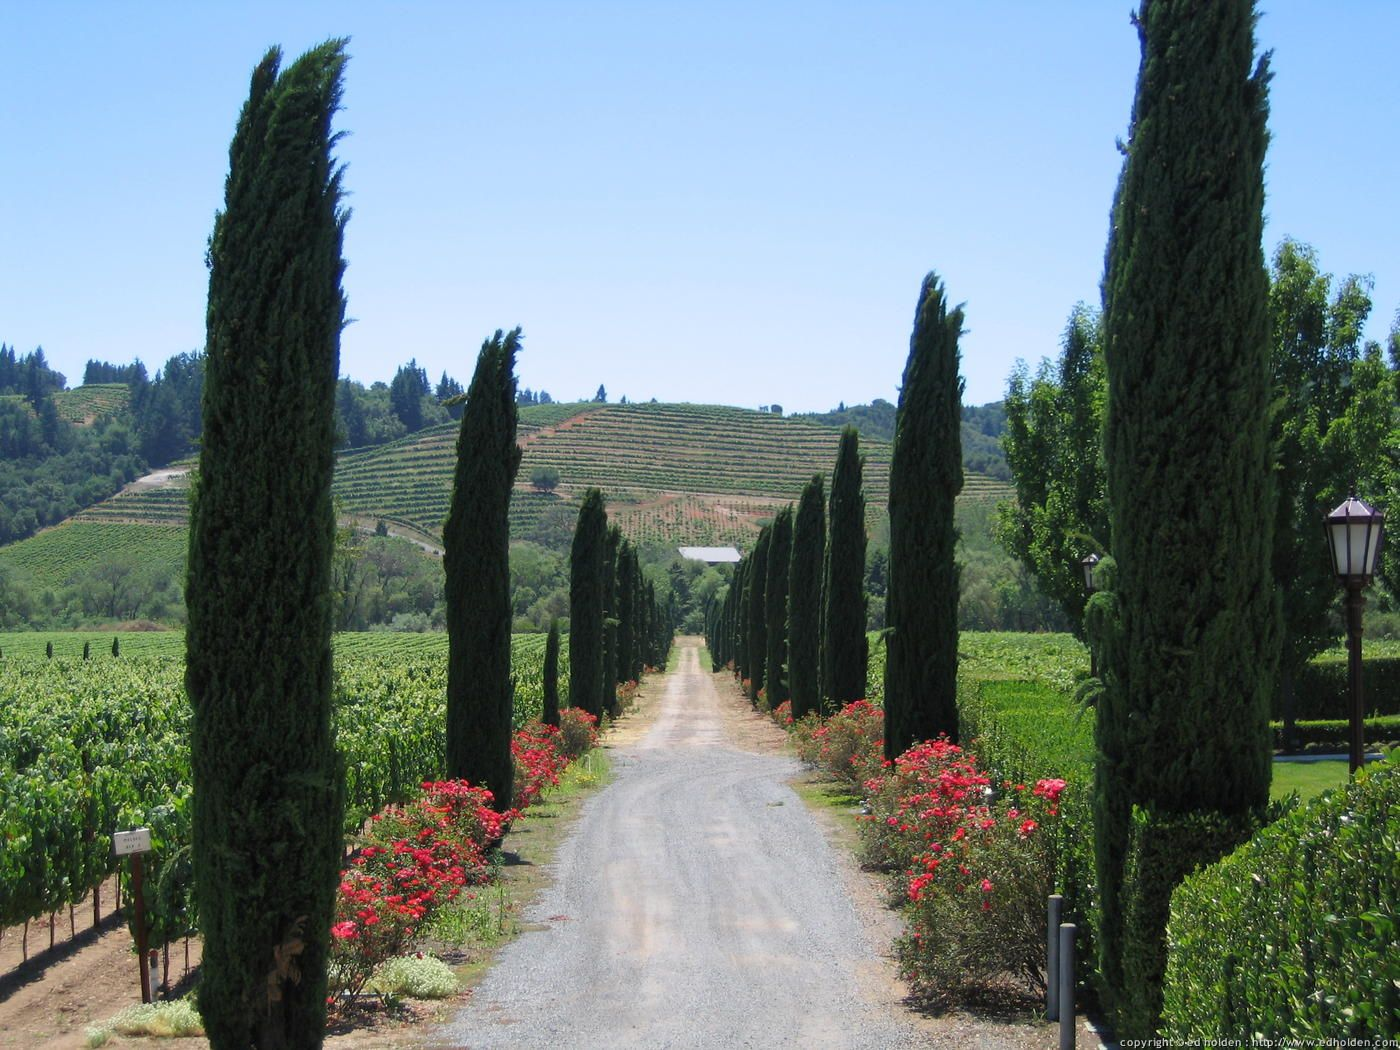 ferrari-carano vineyard and winery, sonoma county, california.